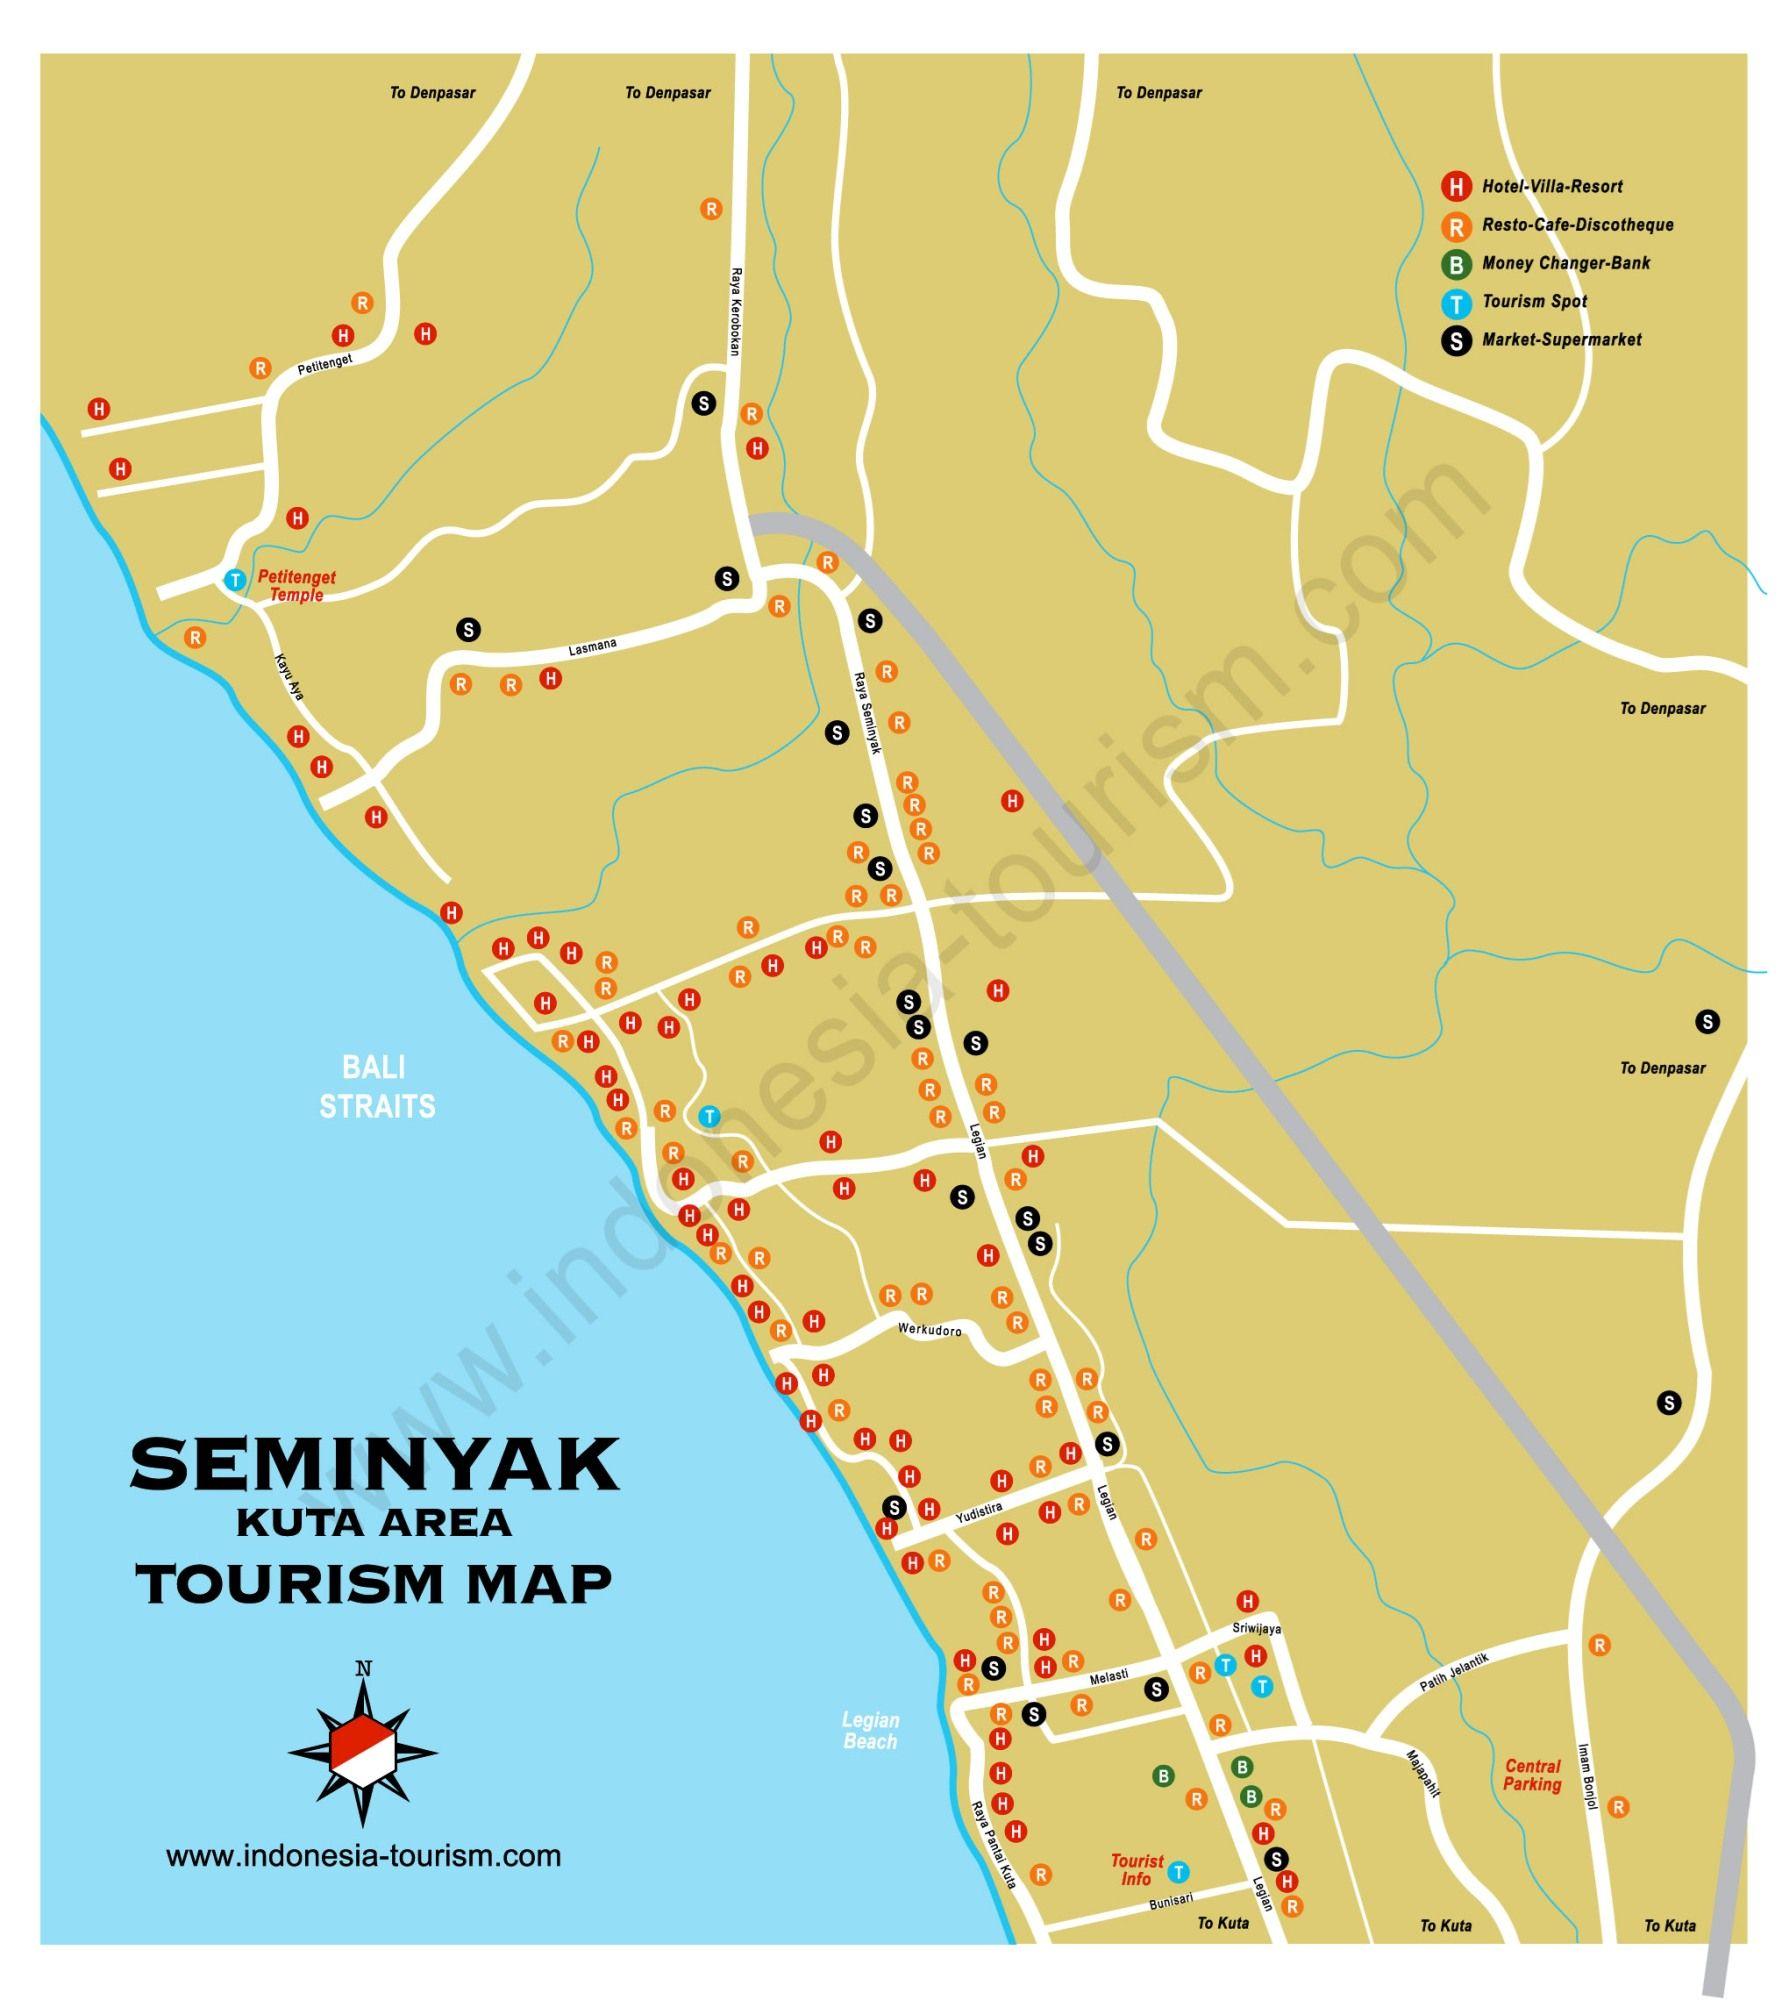 Carte Bali Benoa.Carte Bali Seminyak Indonesia Tourism Bali Bali Map